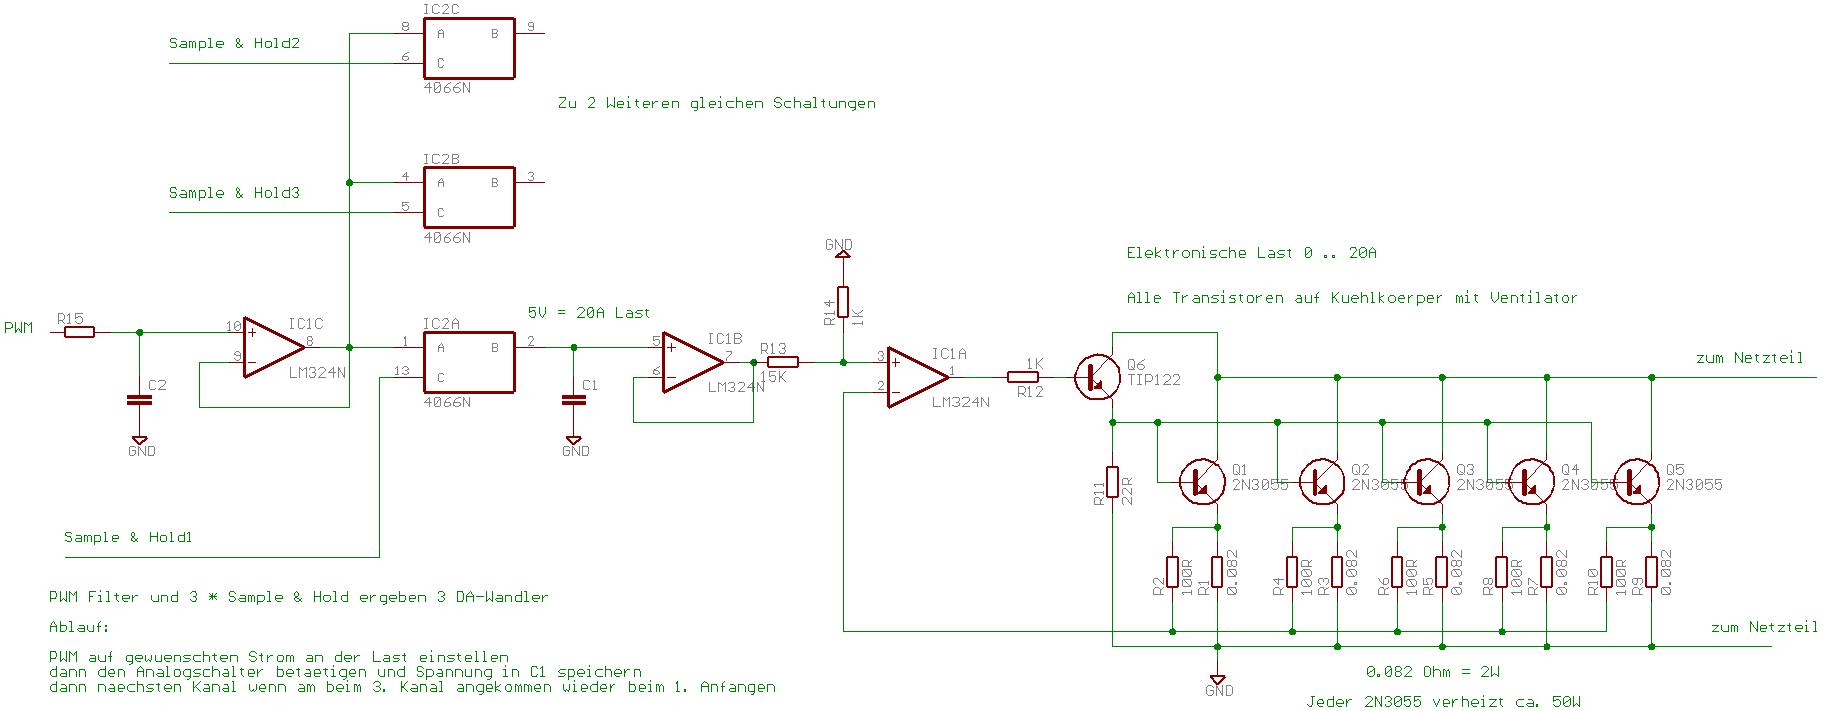 Großzügig Zopfdraht Lieferanten Fotos - Schaltplan Serie Circuit ...